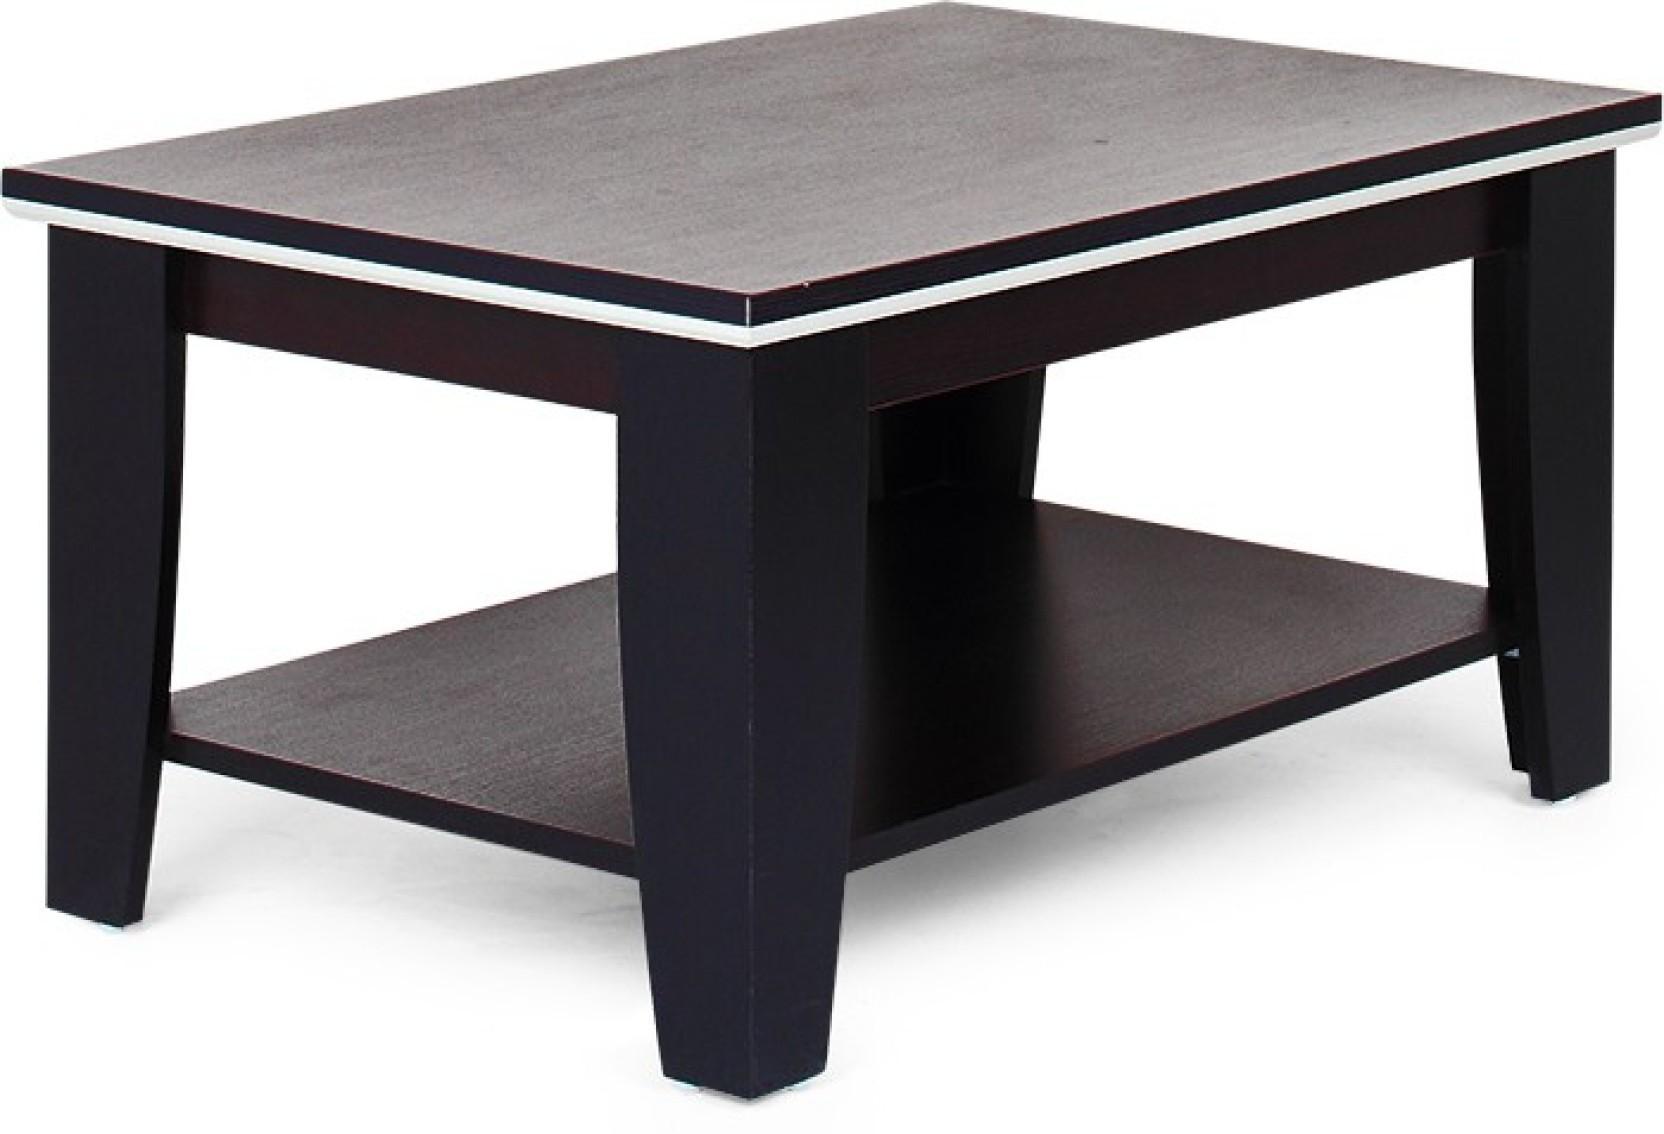 Ewood Kosmo Engineered Wood Coffee Table